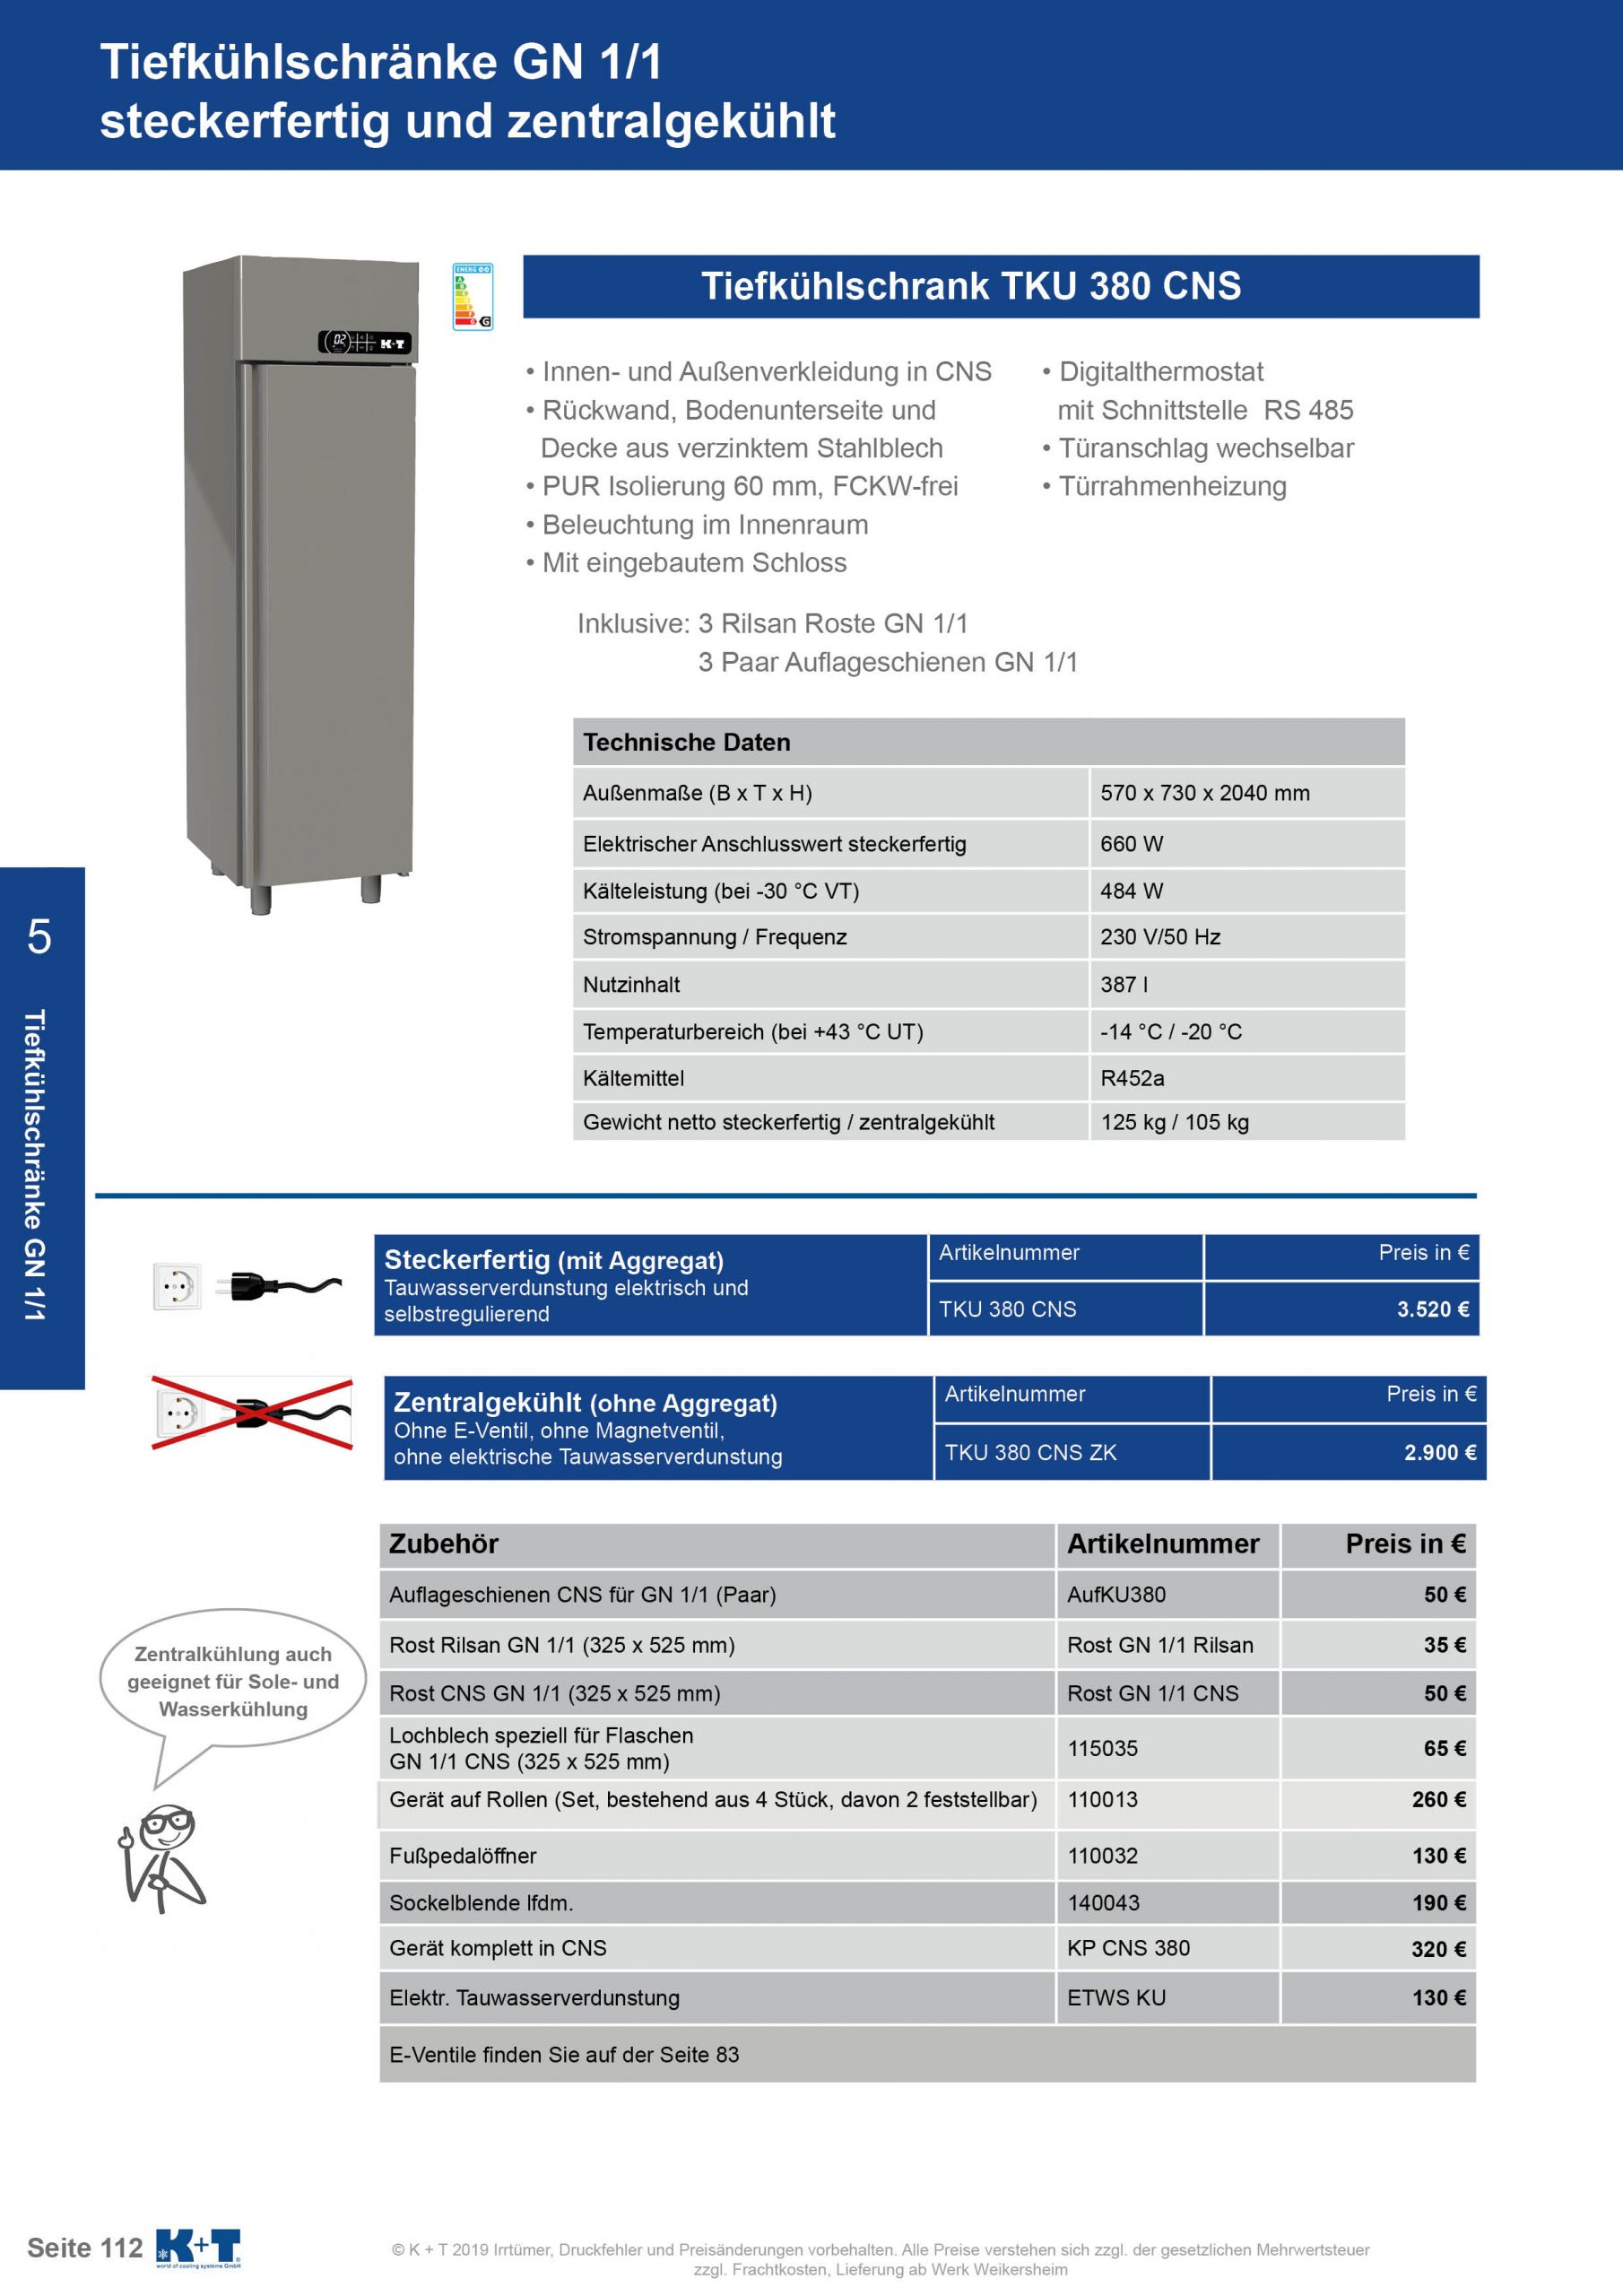 Tiefkühlschränke GN 1_1 Tiefkühlschrank steckerfertig